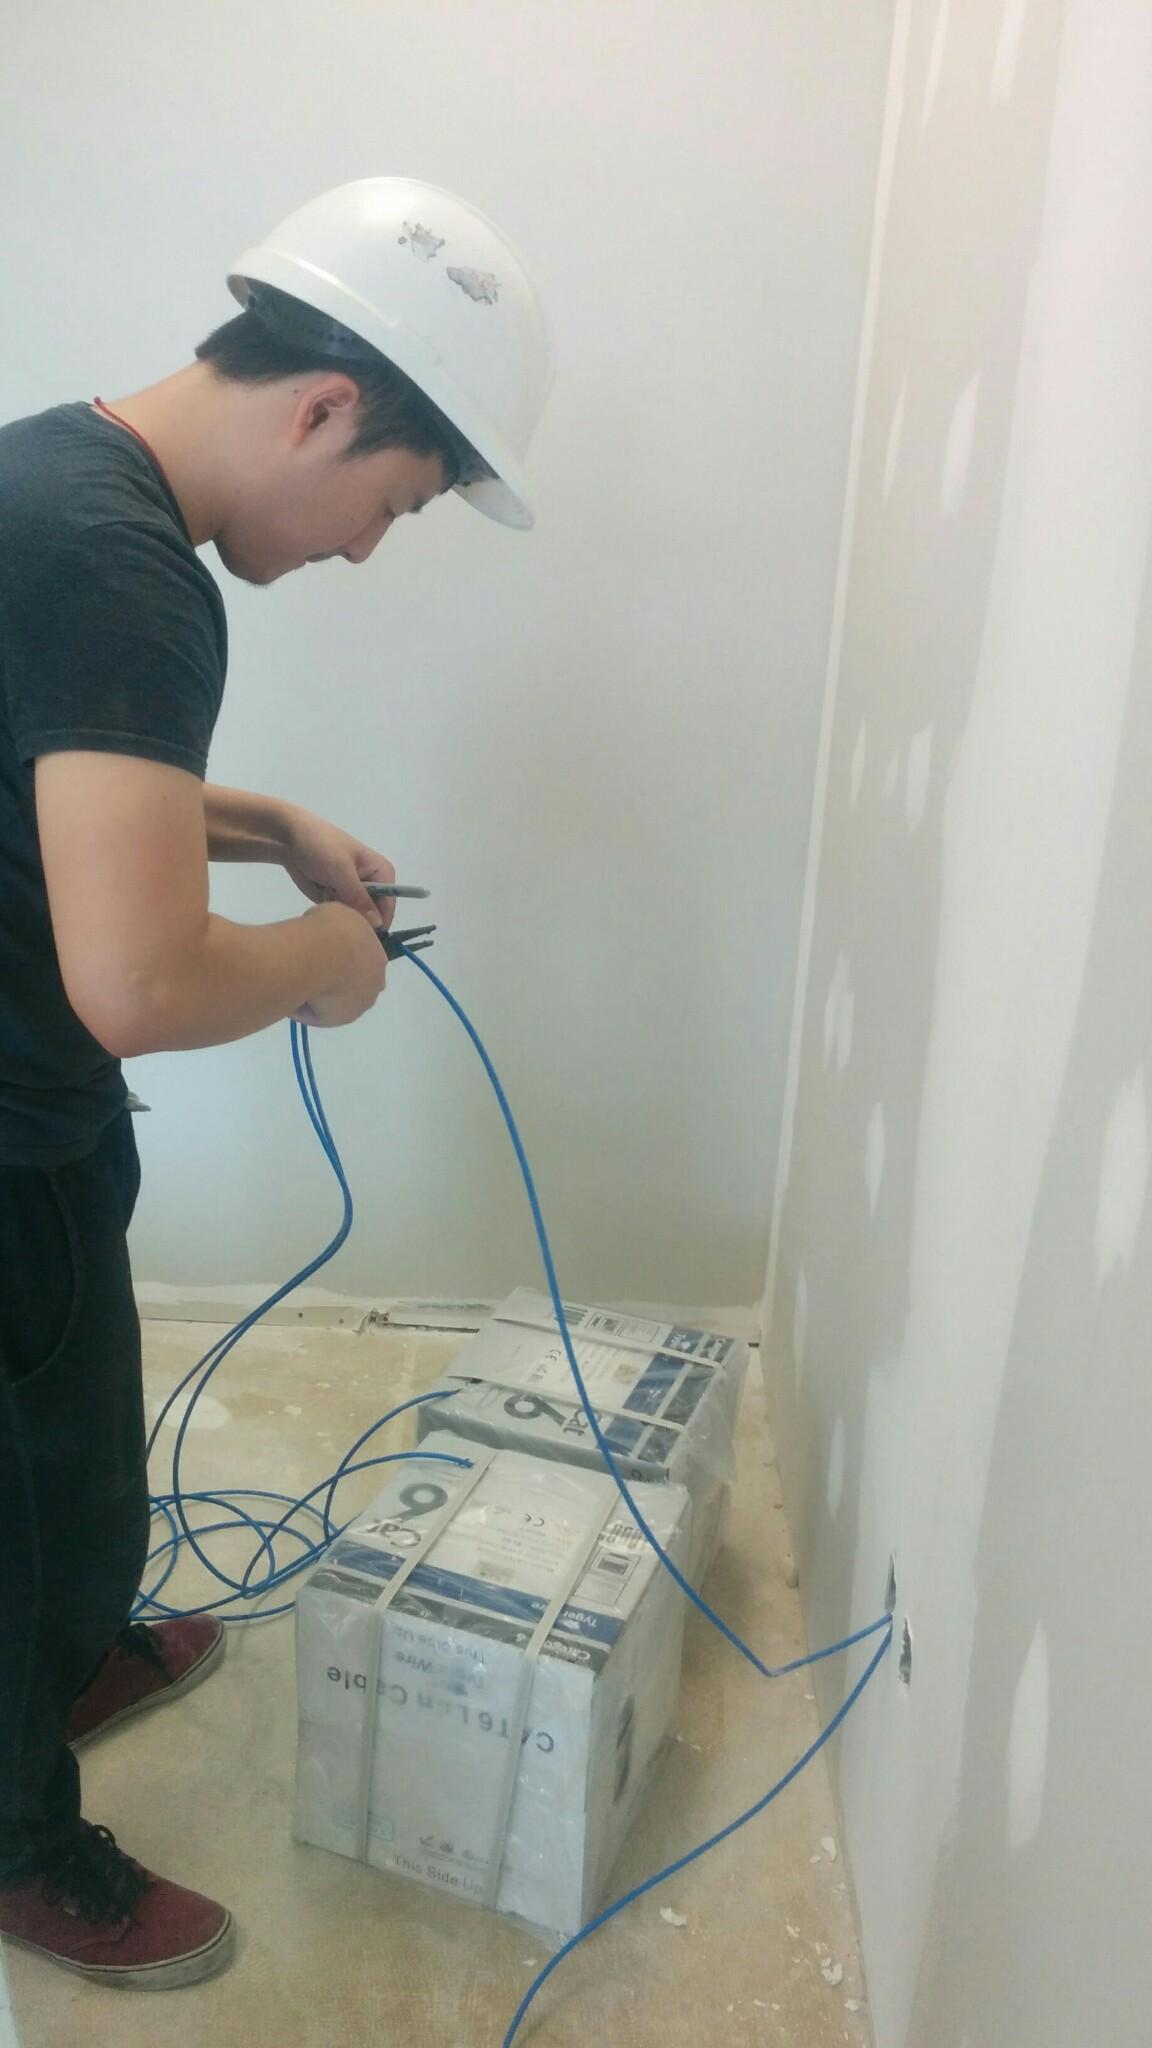 Img 20150601 143919 Leslievillegeek Tv Installation Home Theatre Wiring